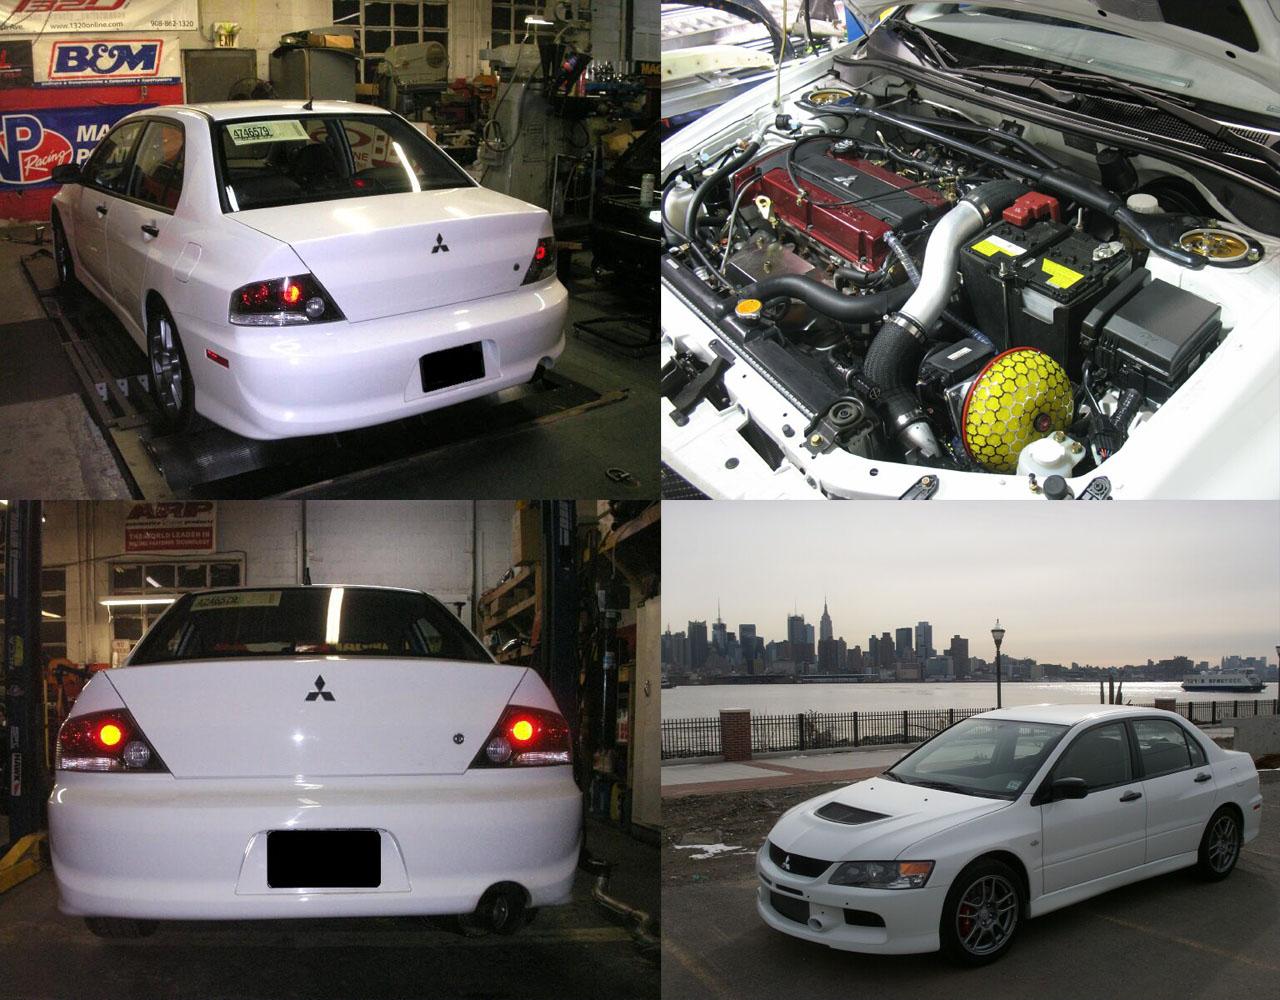 2006 Mitsubishi Lancer EVO IX RS Pictures, Mods, Upgrades, Wallpaper - DragTimes.com